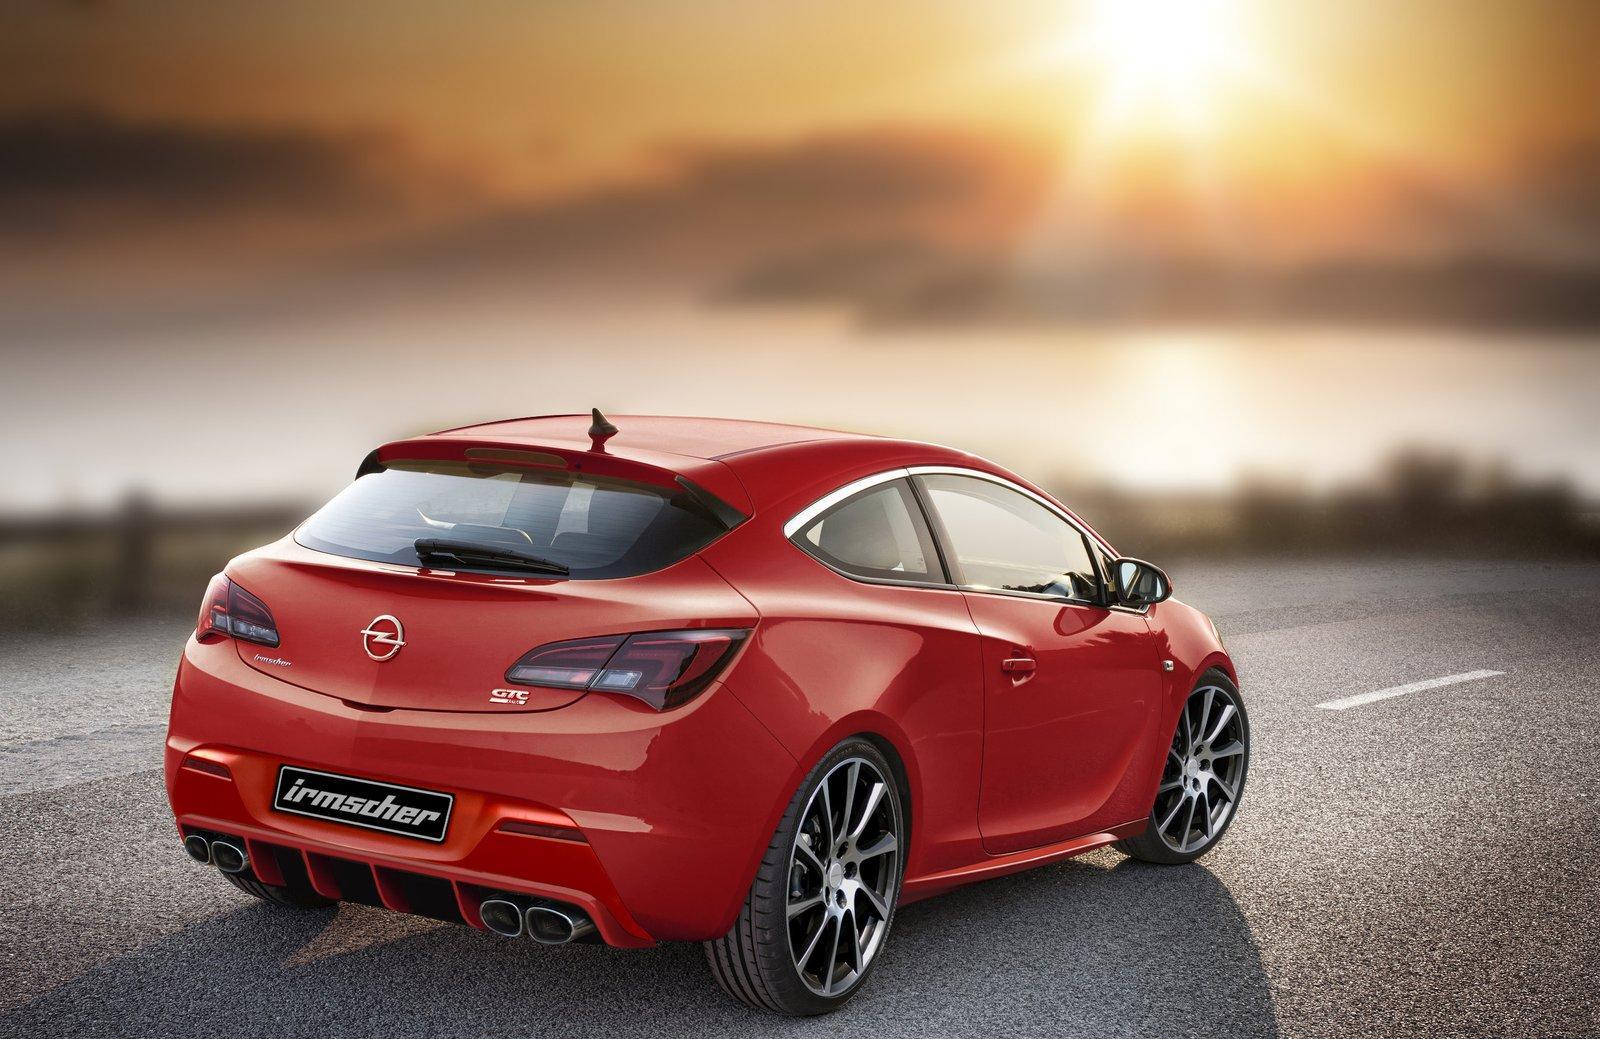 Amazing Irmscher Opel Astra GTC